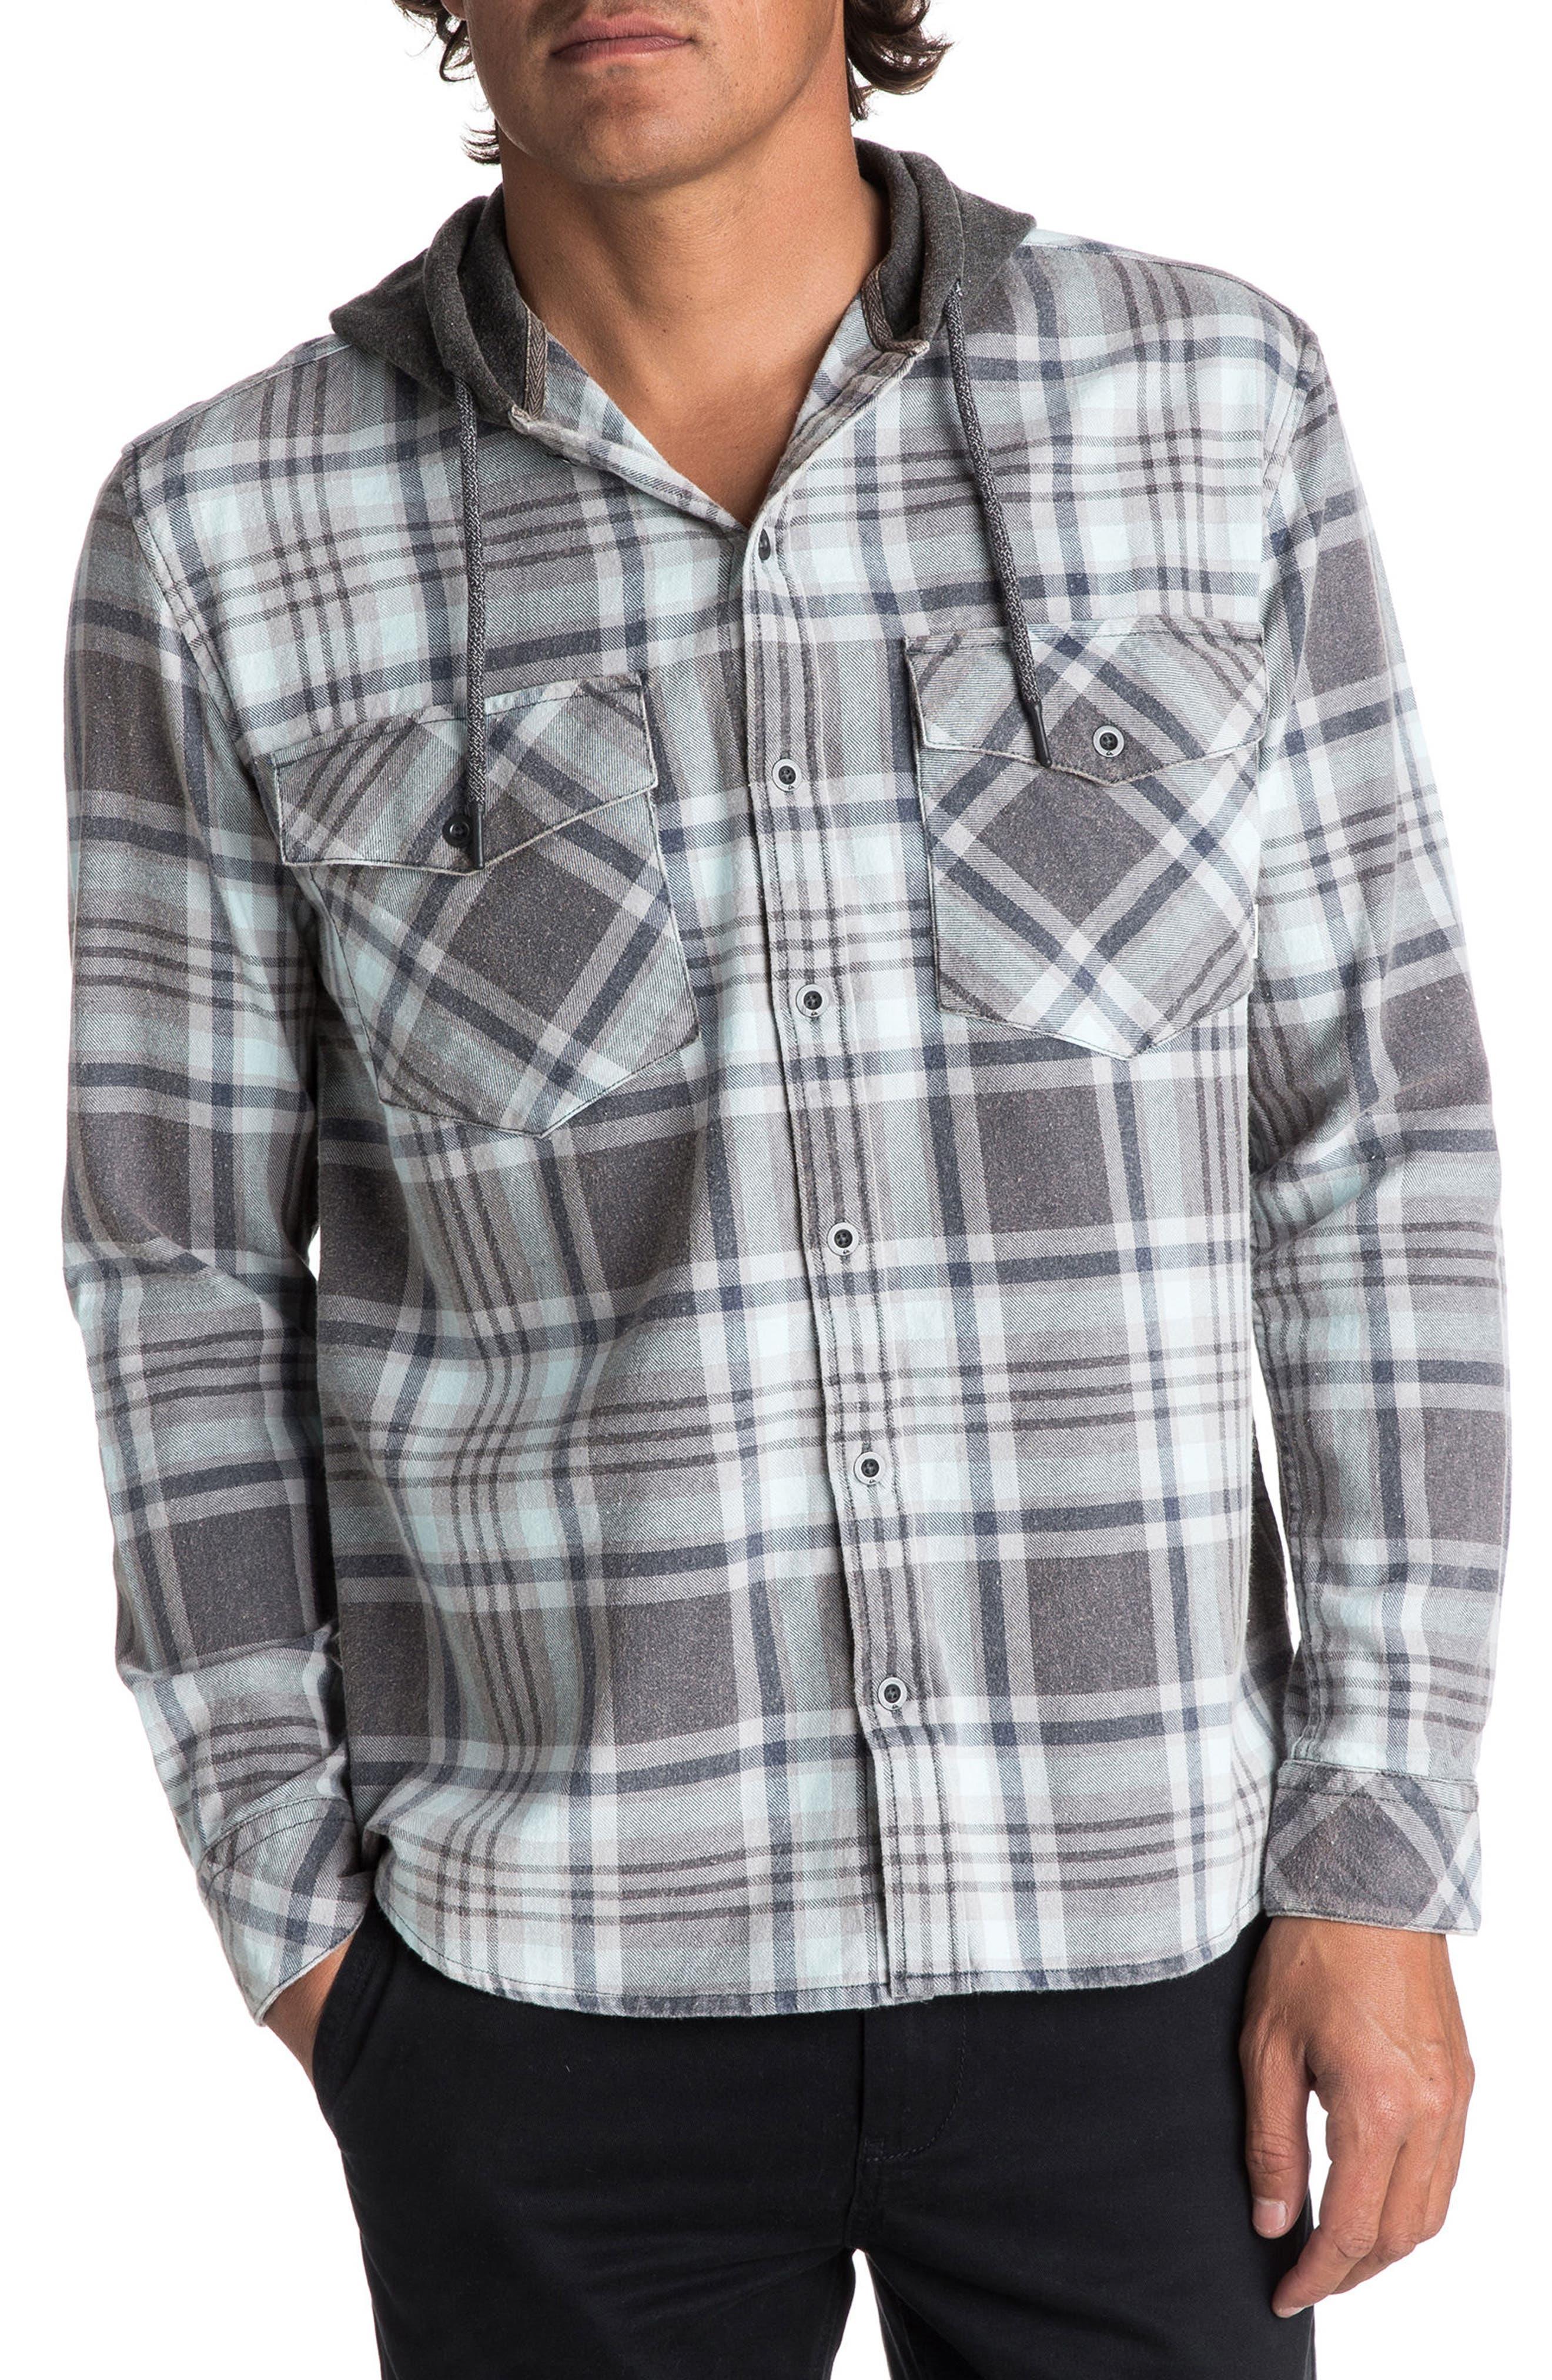 Quiksilver Tang Hooded Woven Shirt